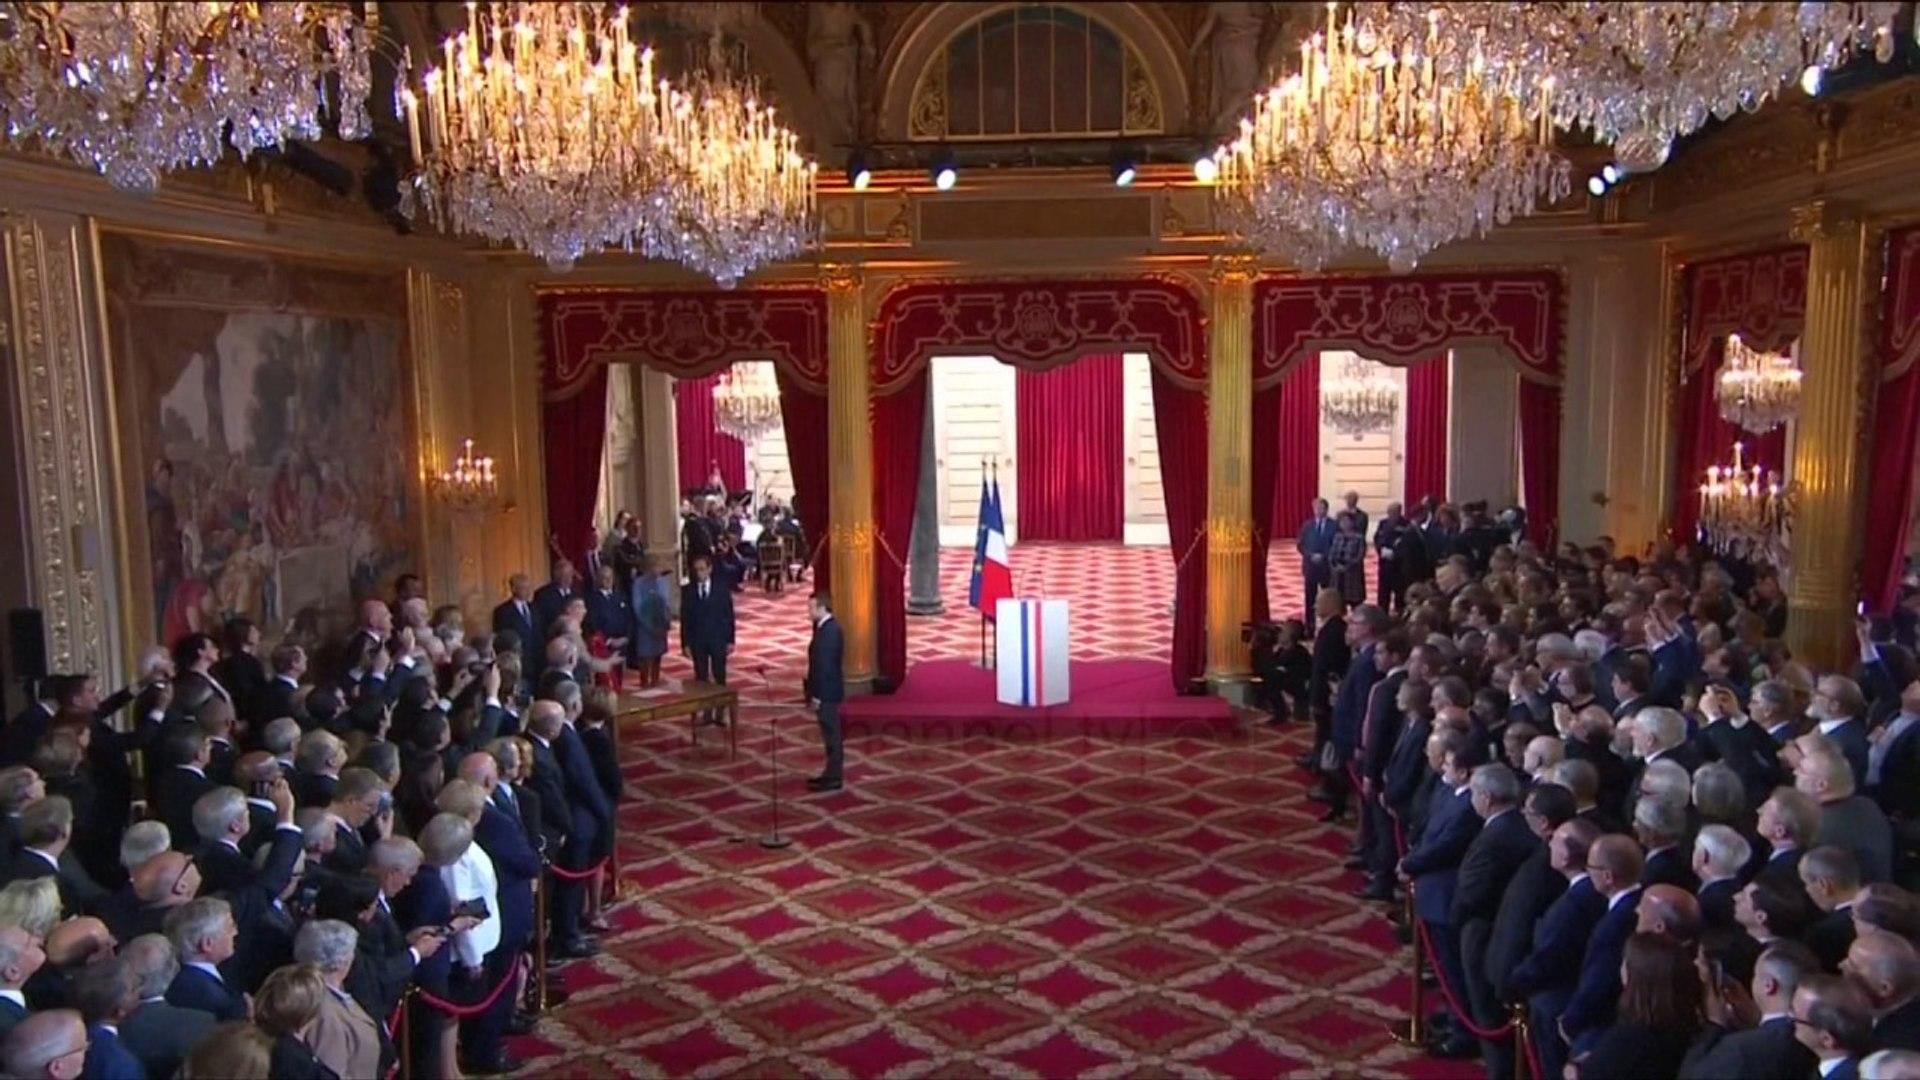 Francë, Macron betohet si president - Top Channel Albania - News - Lajme